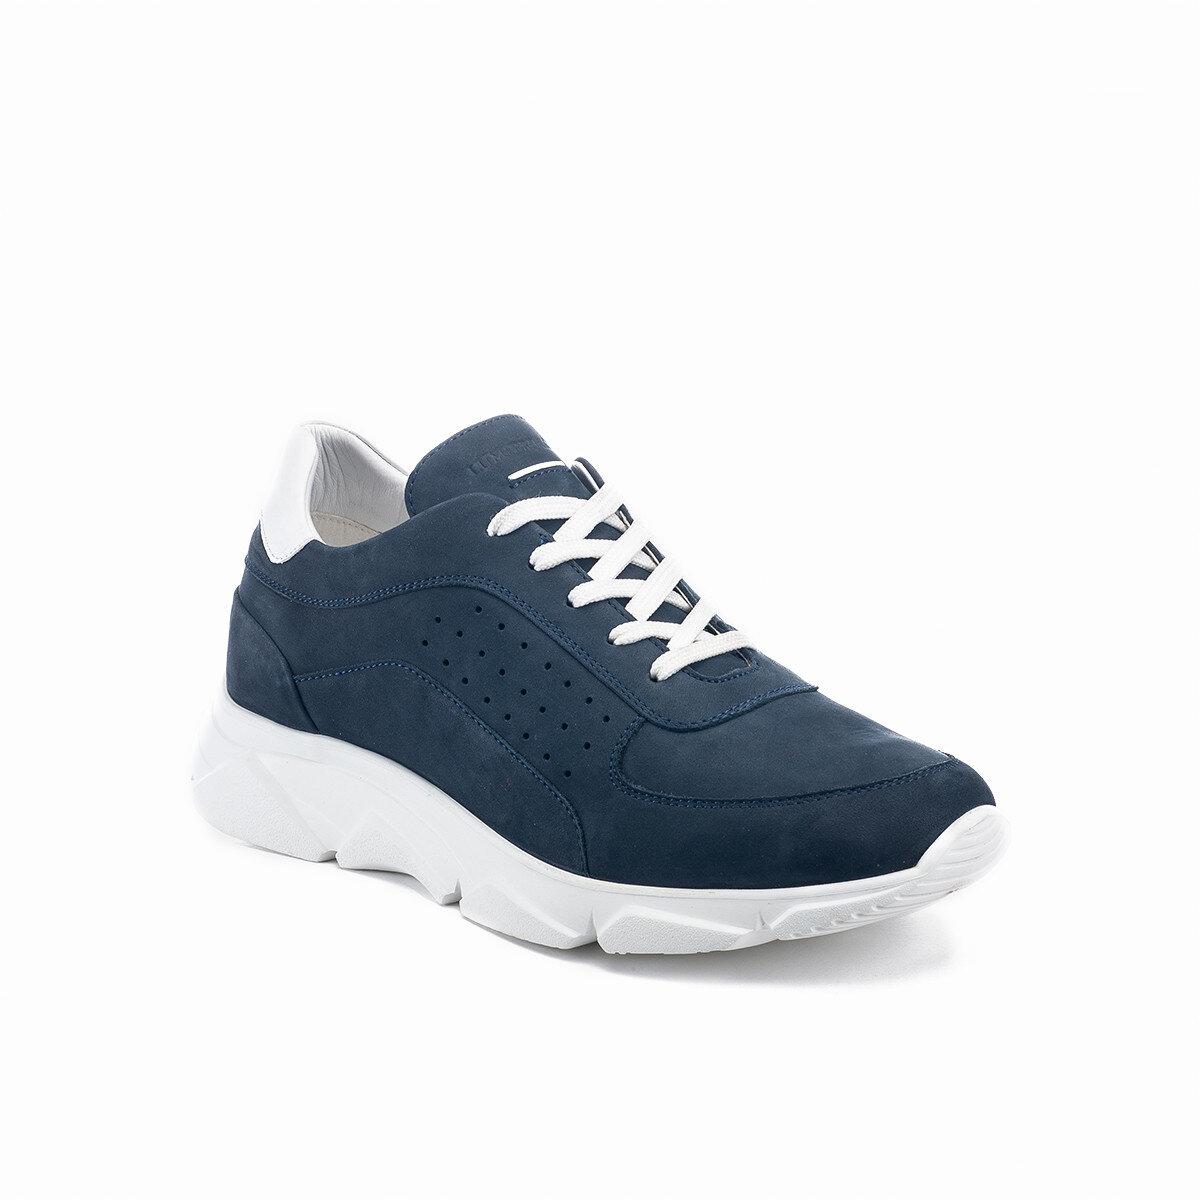 BERRET Sneakers Uomo